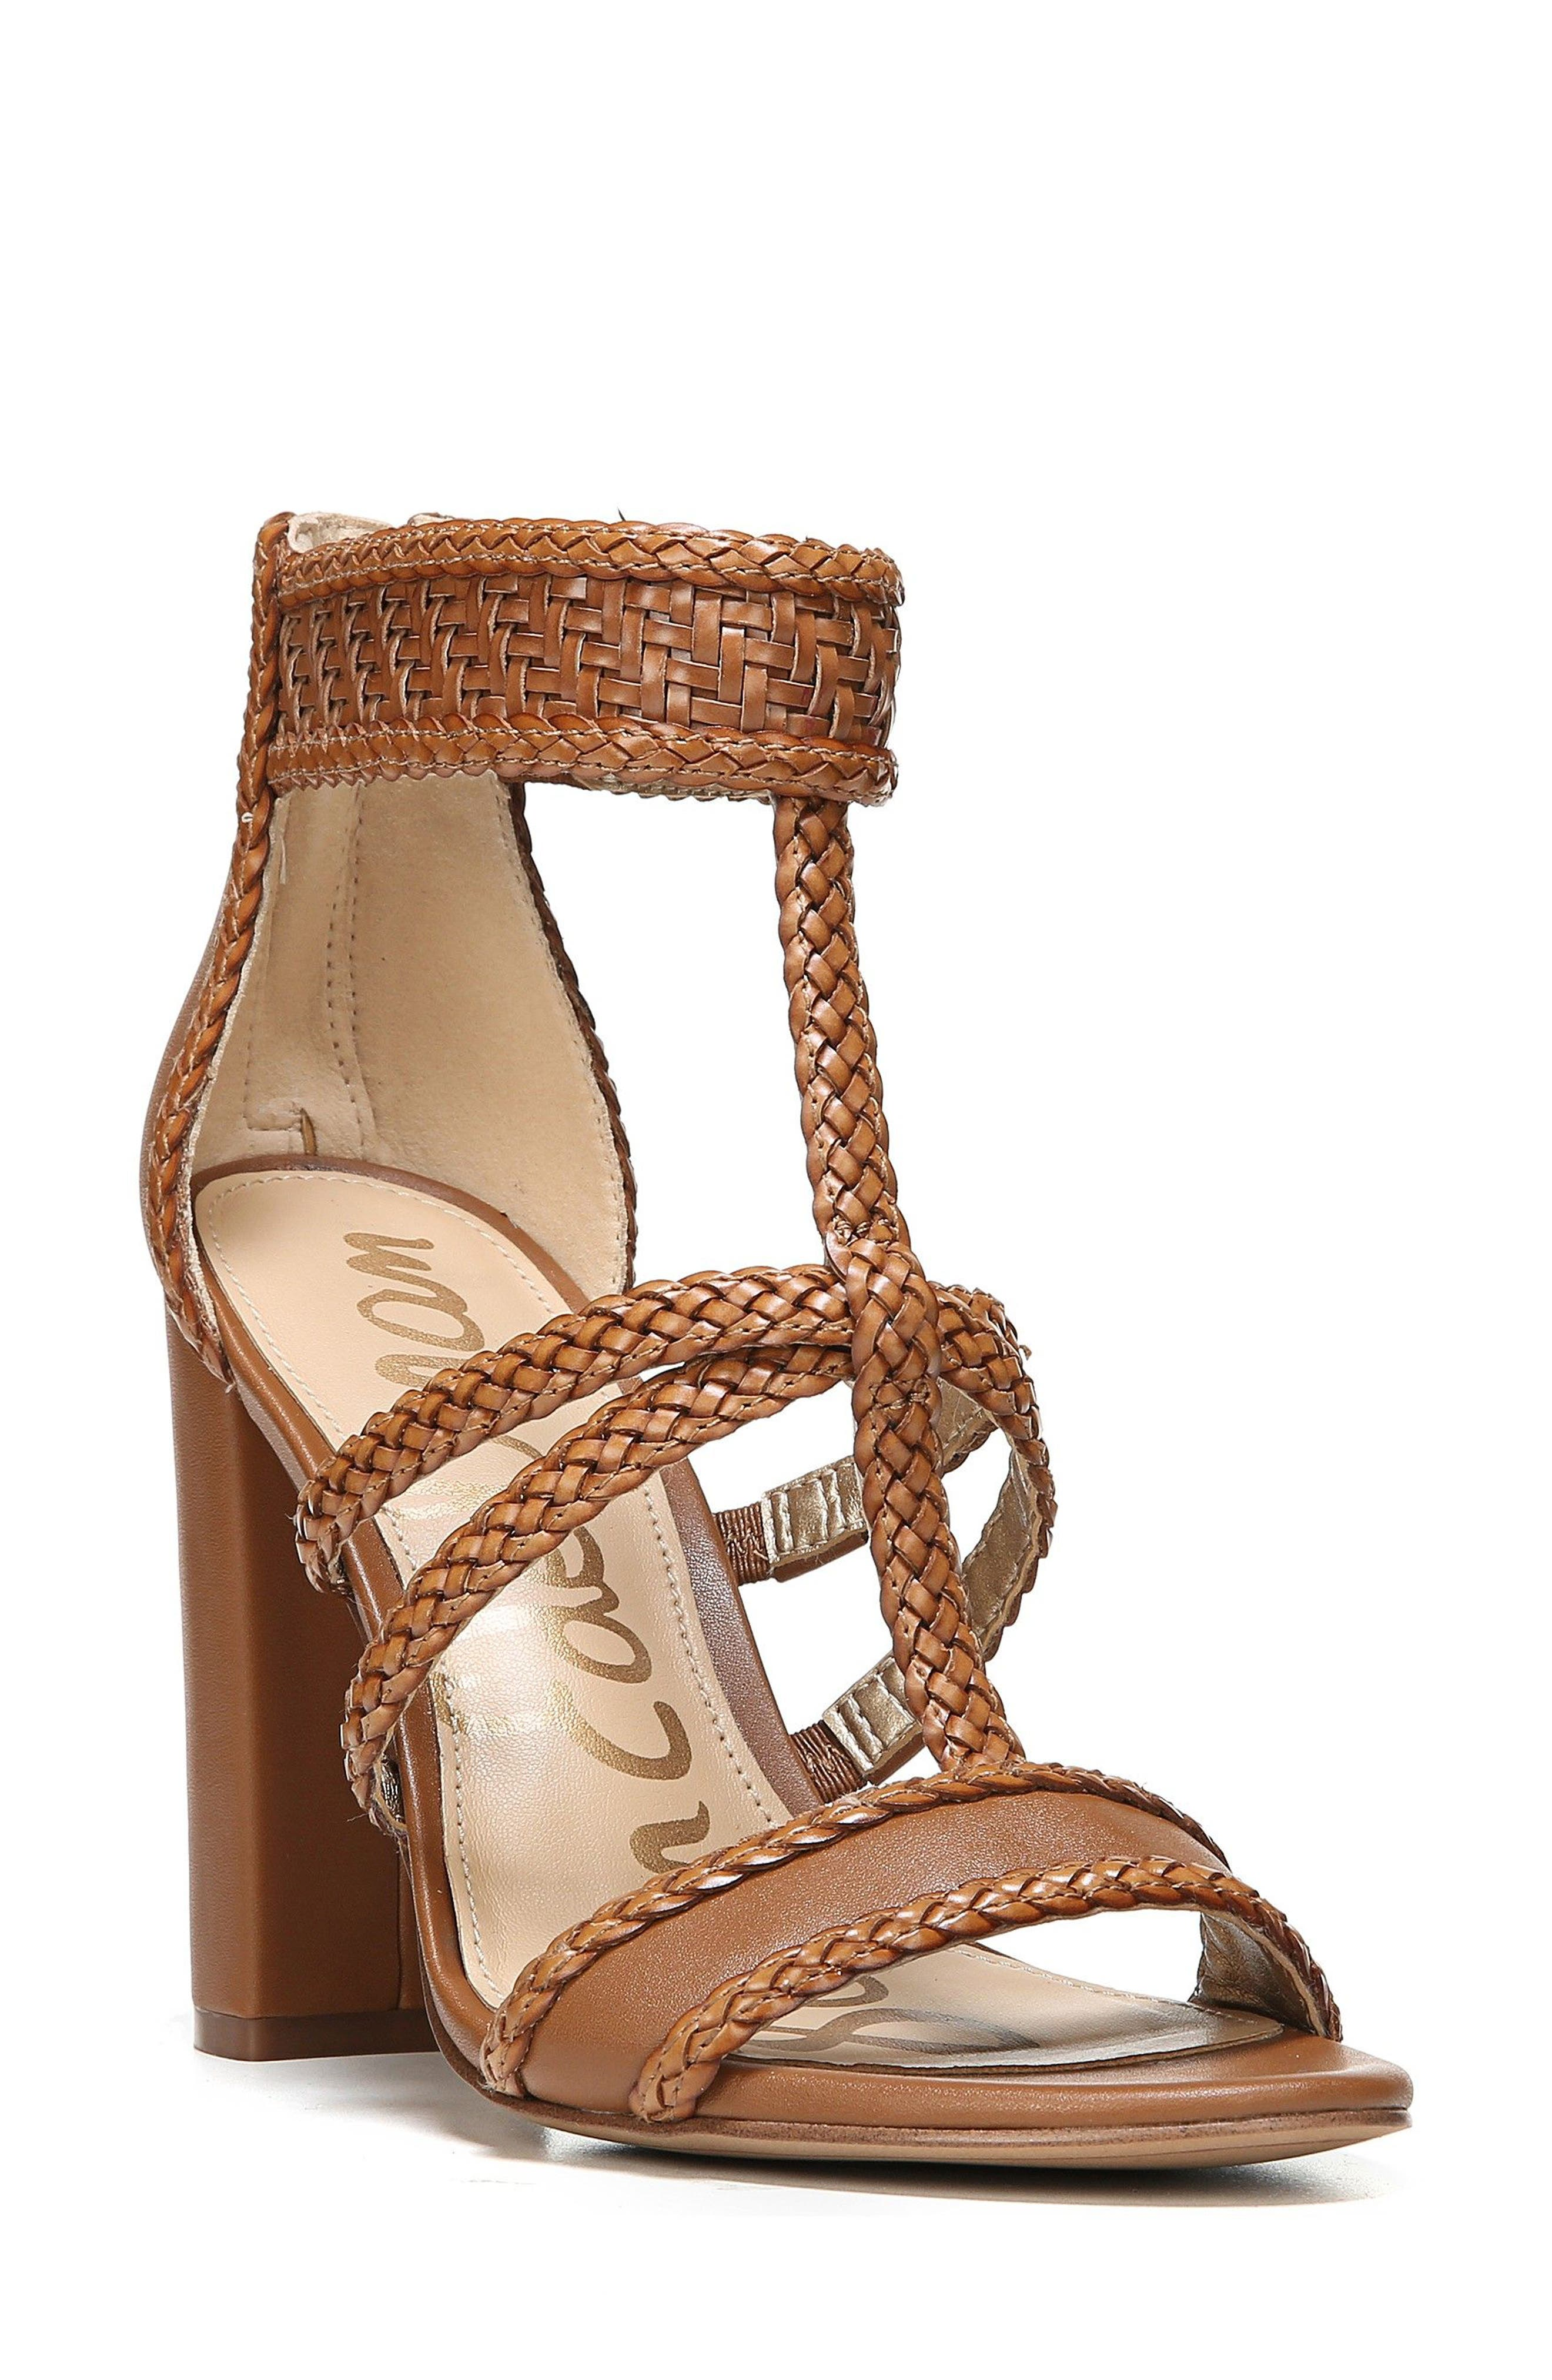 Alternate Image 1 Selected - Sam Edelman Yordana Woven T-Strap Sandal (Women)